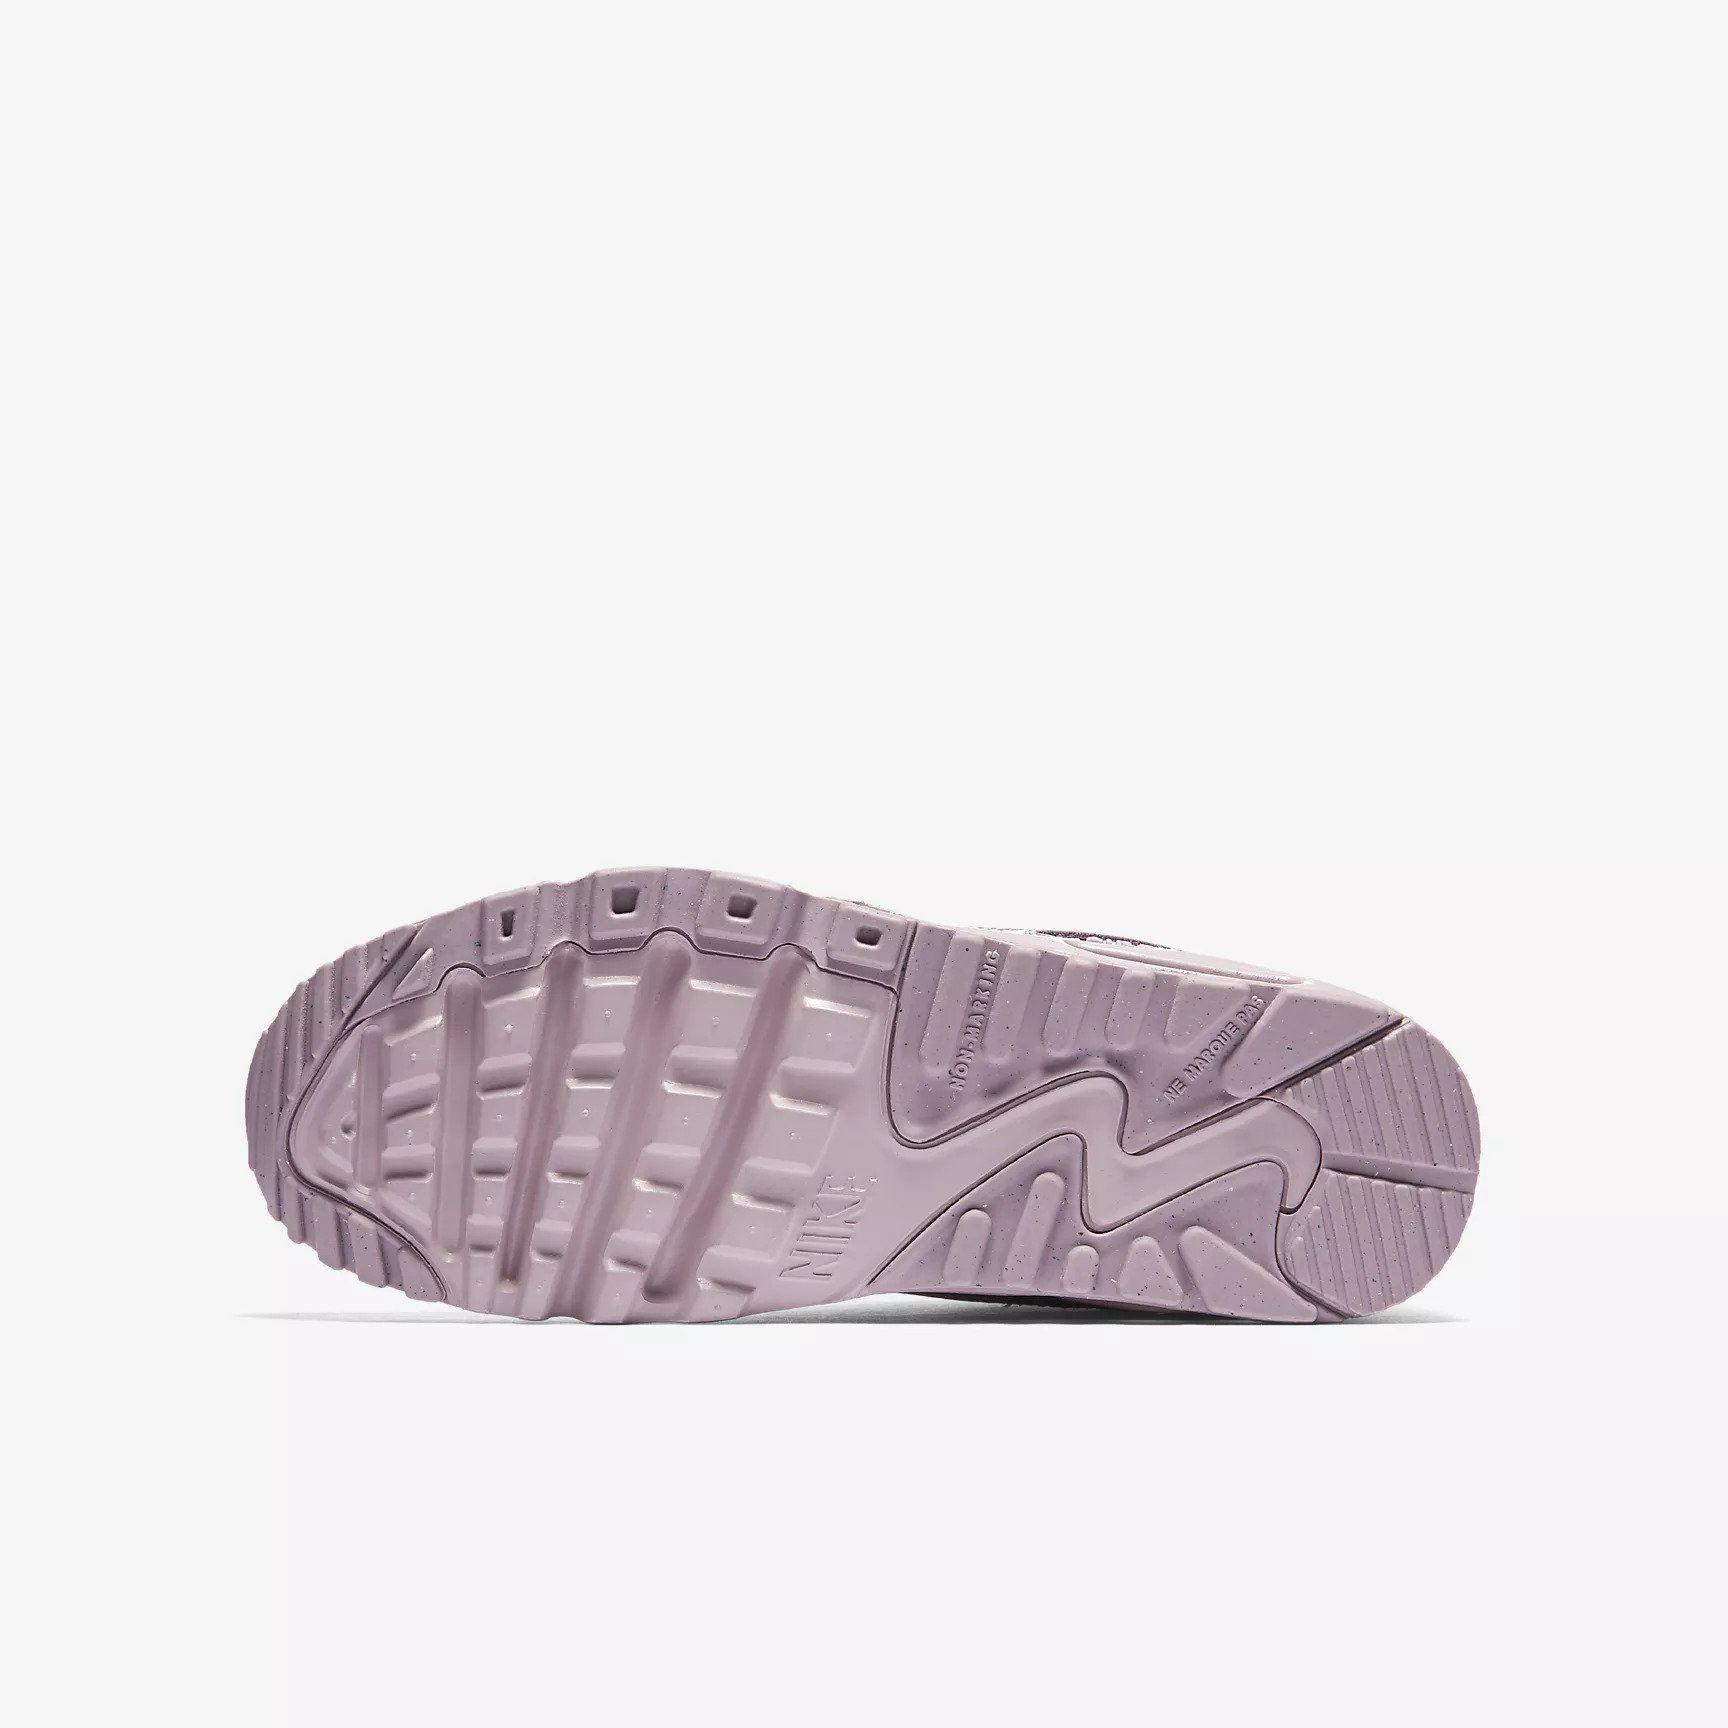 Details about Nike Air Max 90 SE LTR (GS) Elemental Rose 859633 600 Girls UK 3 5.5